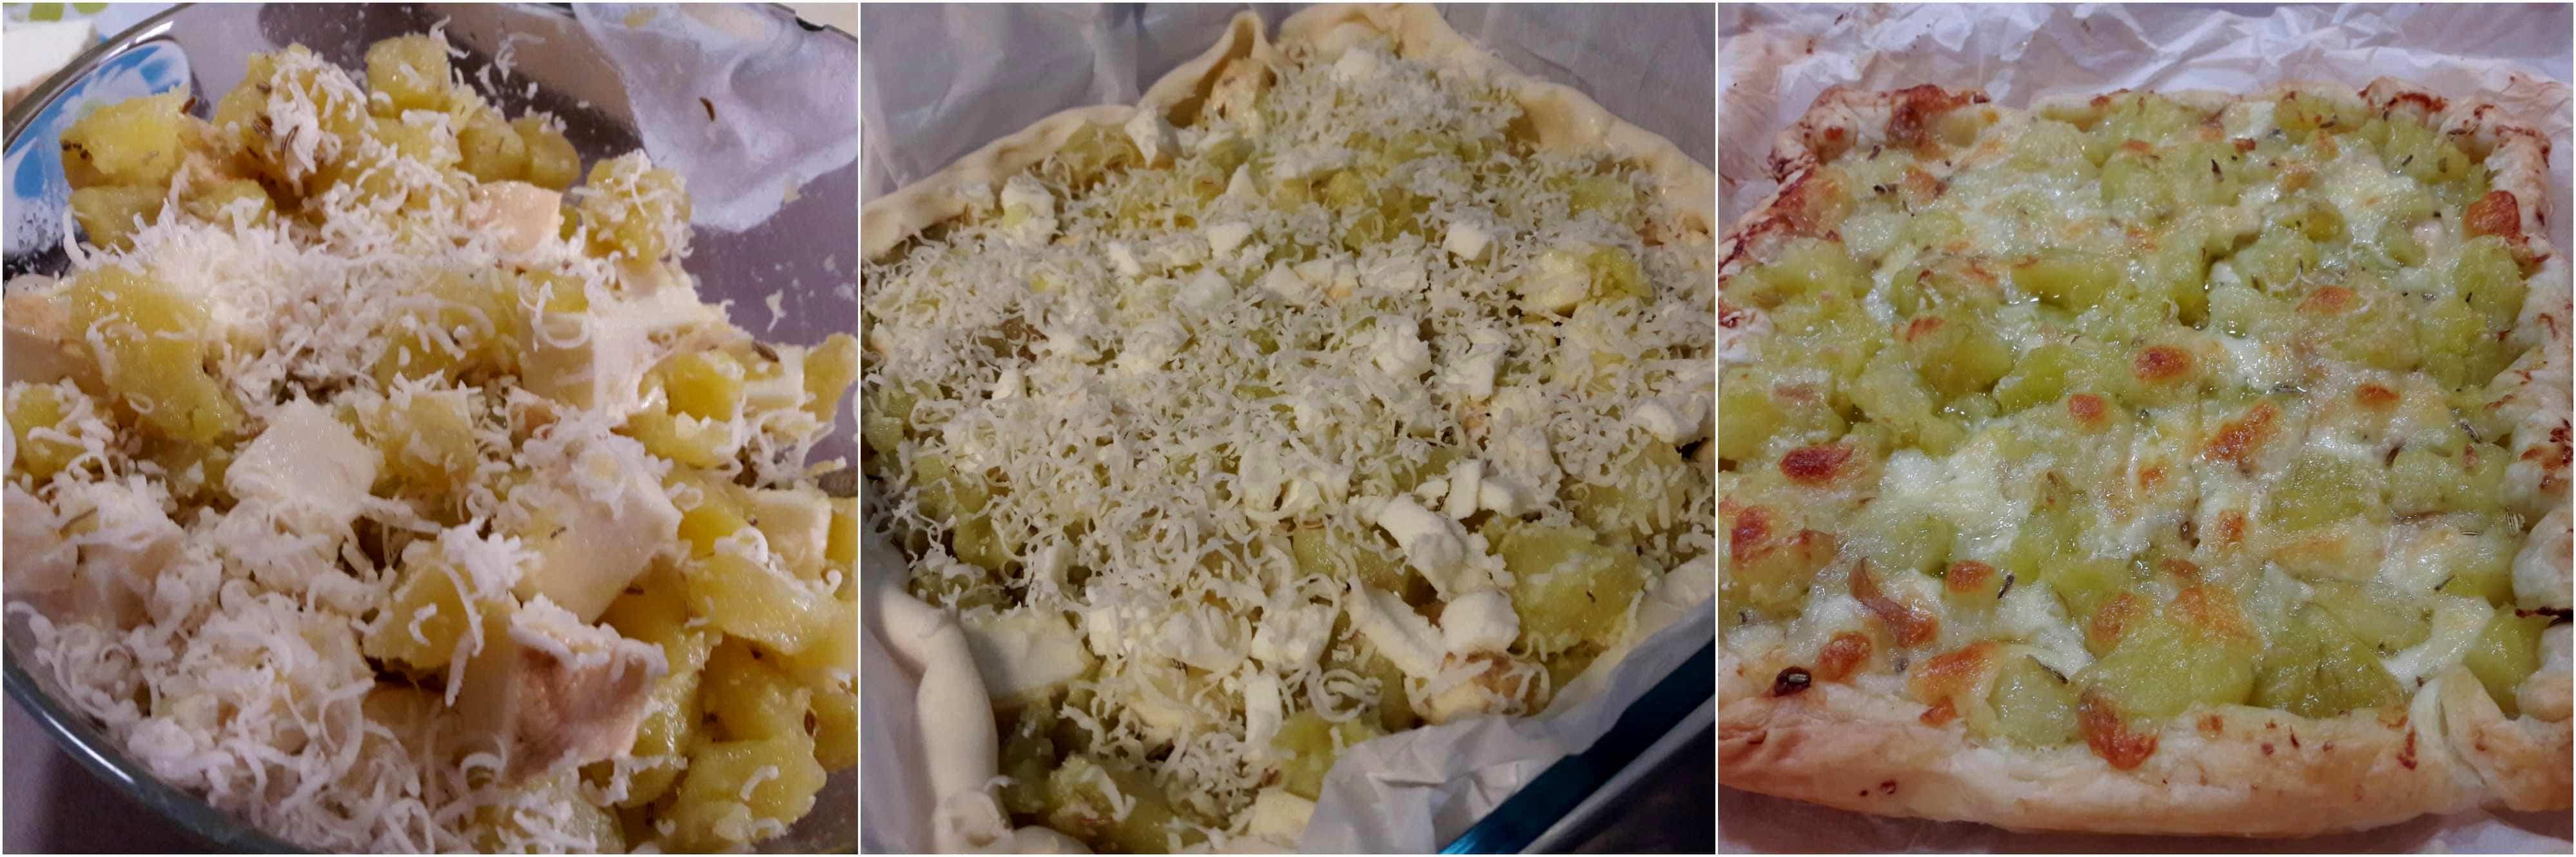 torta patate formaggi box 2-2